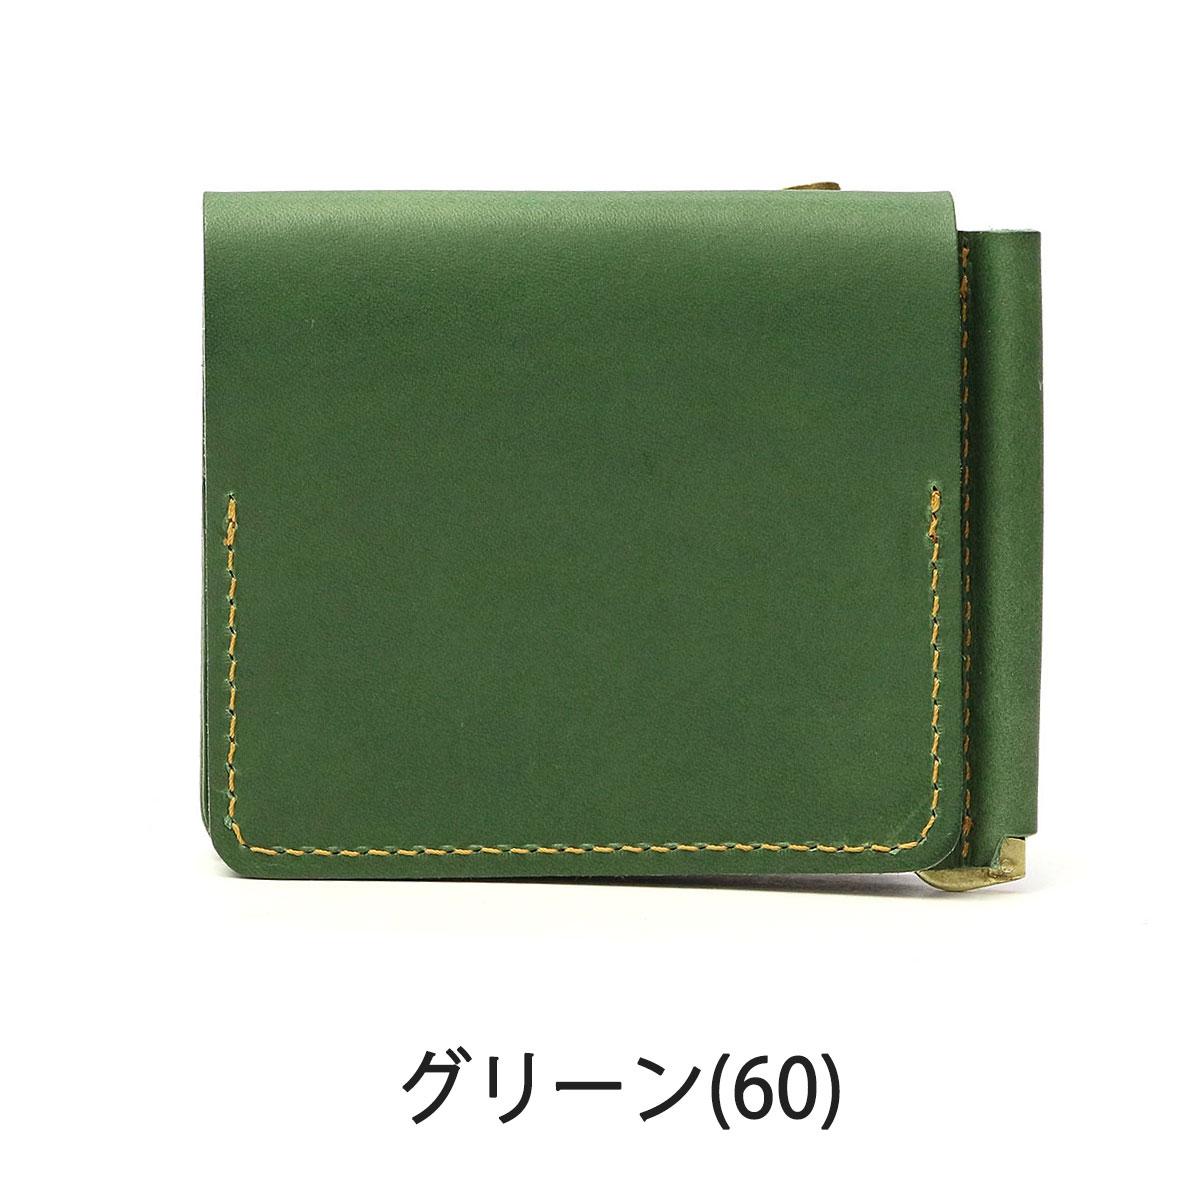 SLOW钱包托斯卡纳女士333S34C